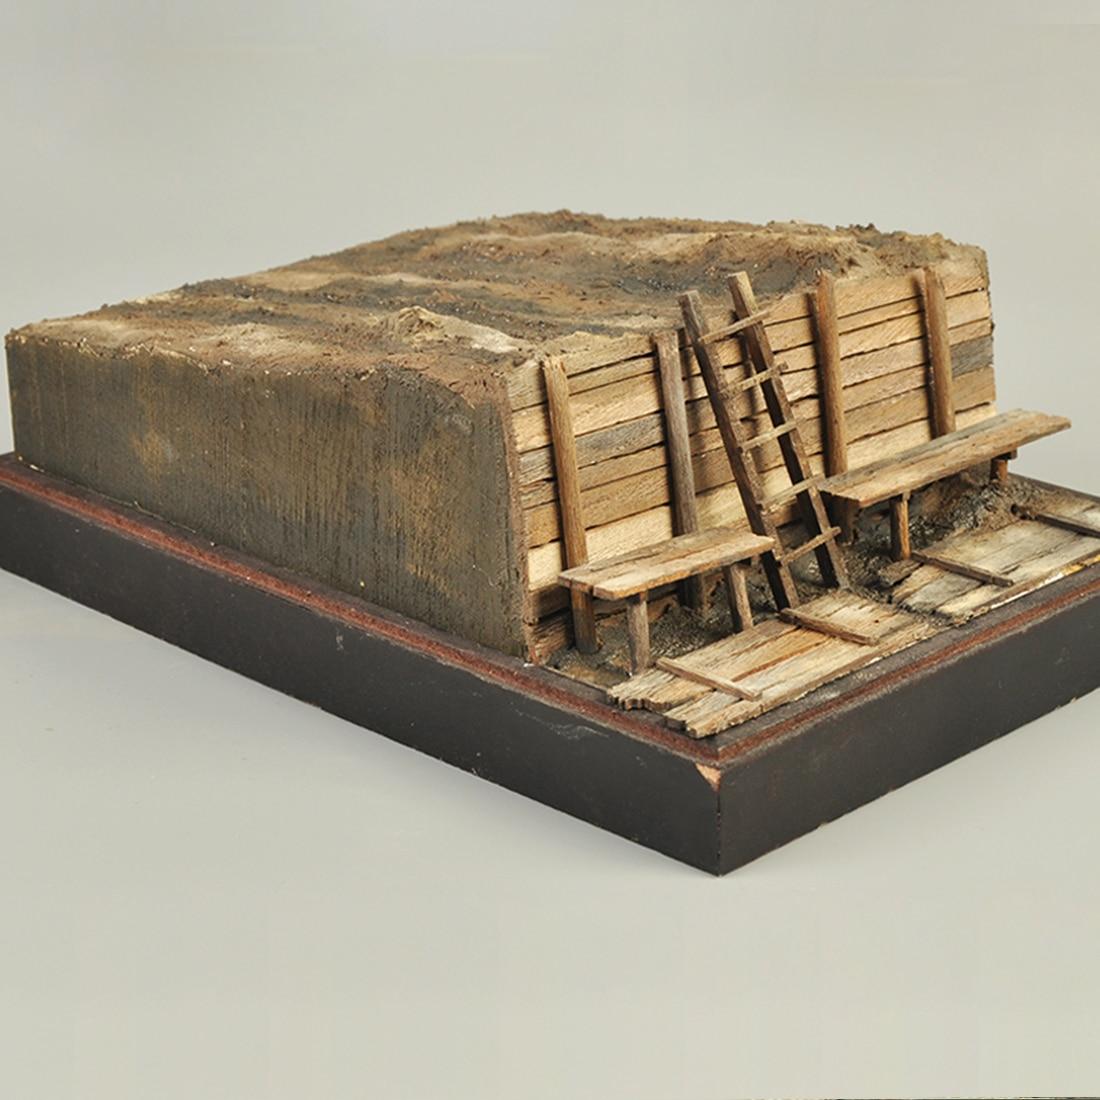 1/35 25 X 18cm DIY Military Sand Table Construction Model Trench Scene Platform Kits Model Building Kits 2019 New